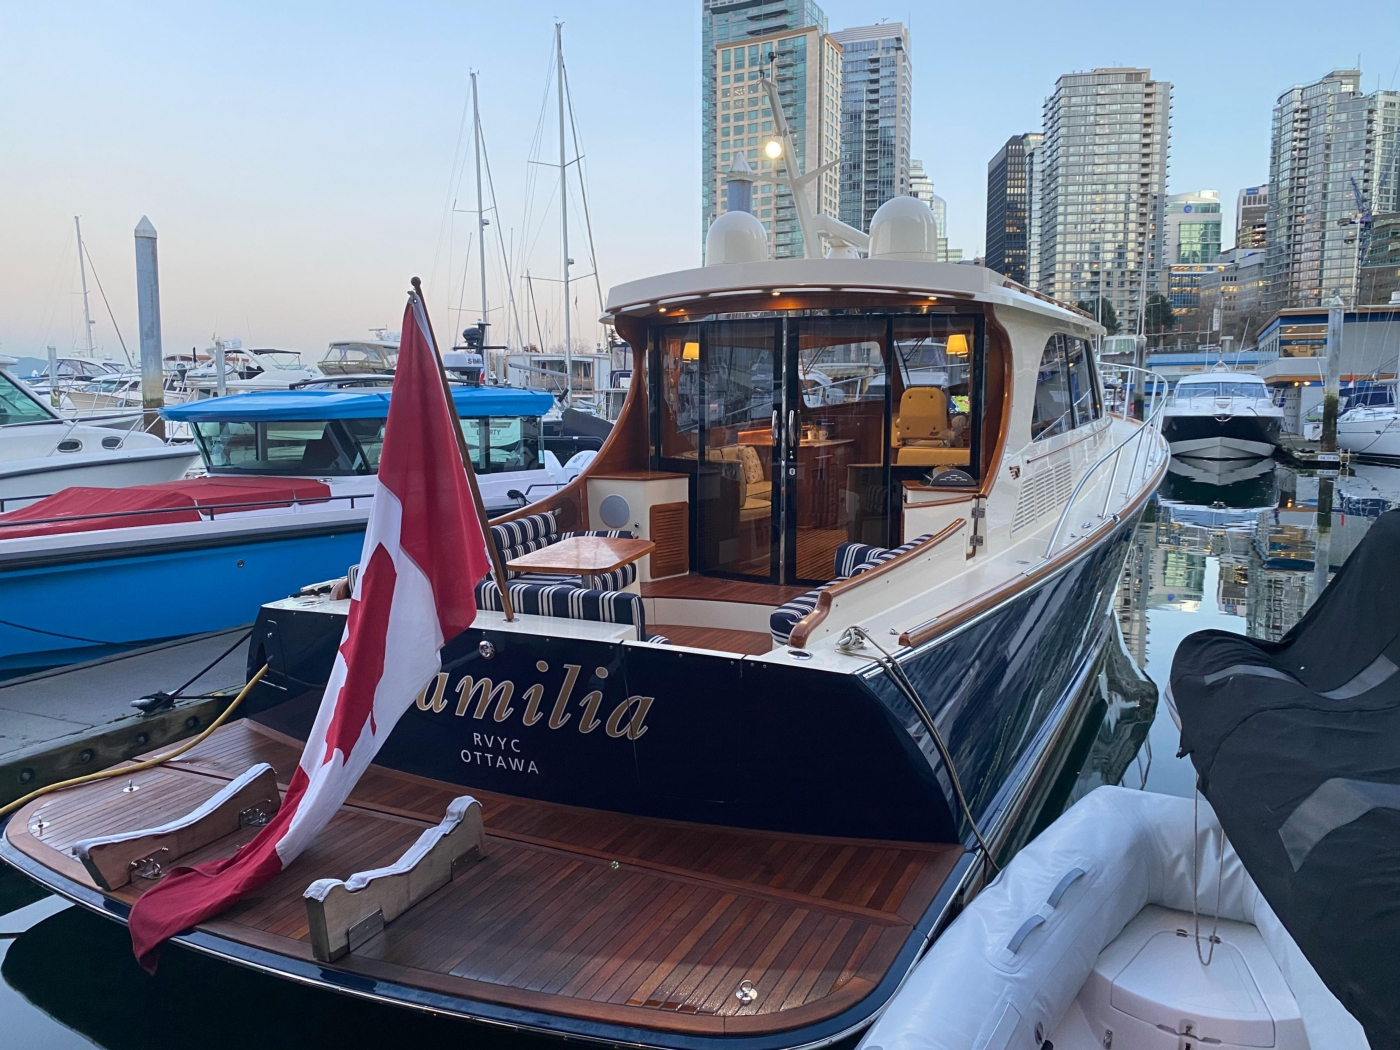 2018 Hinckley Talaria 48 MKII, At dock starboard